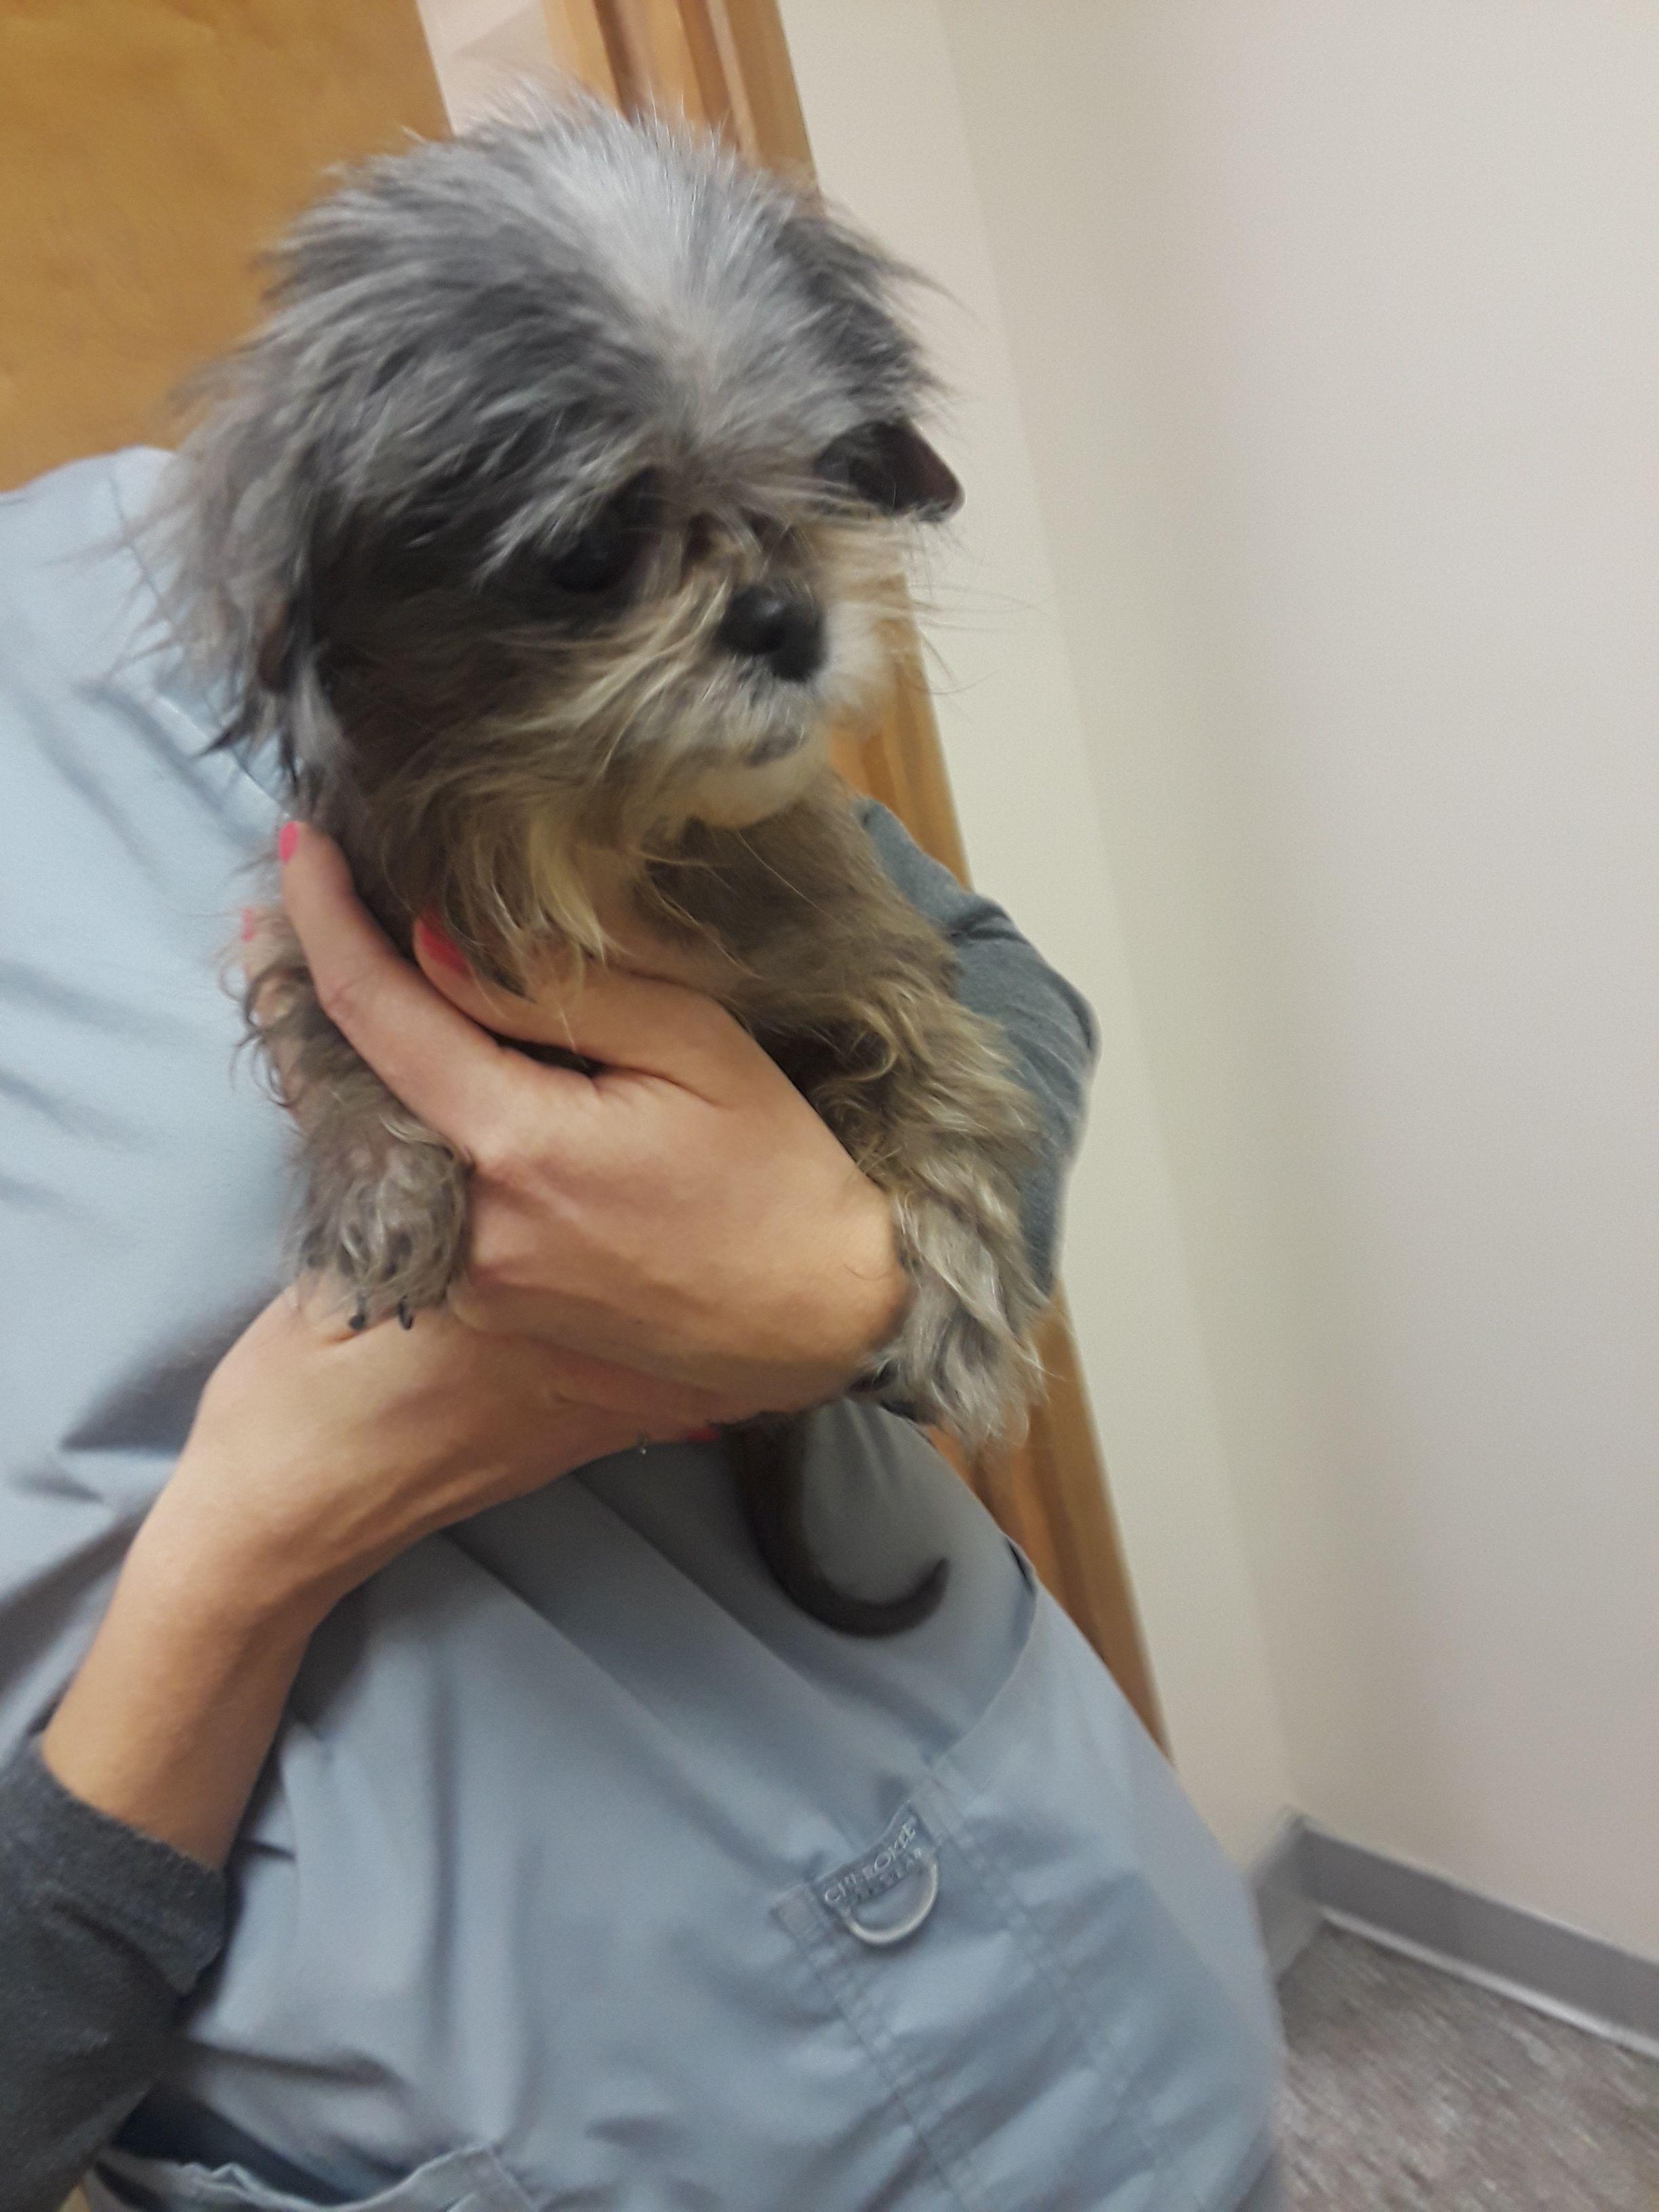 Adopt Annabelle On Adoption Dog Adoption Dogs